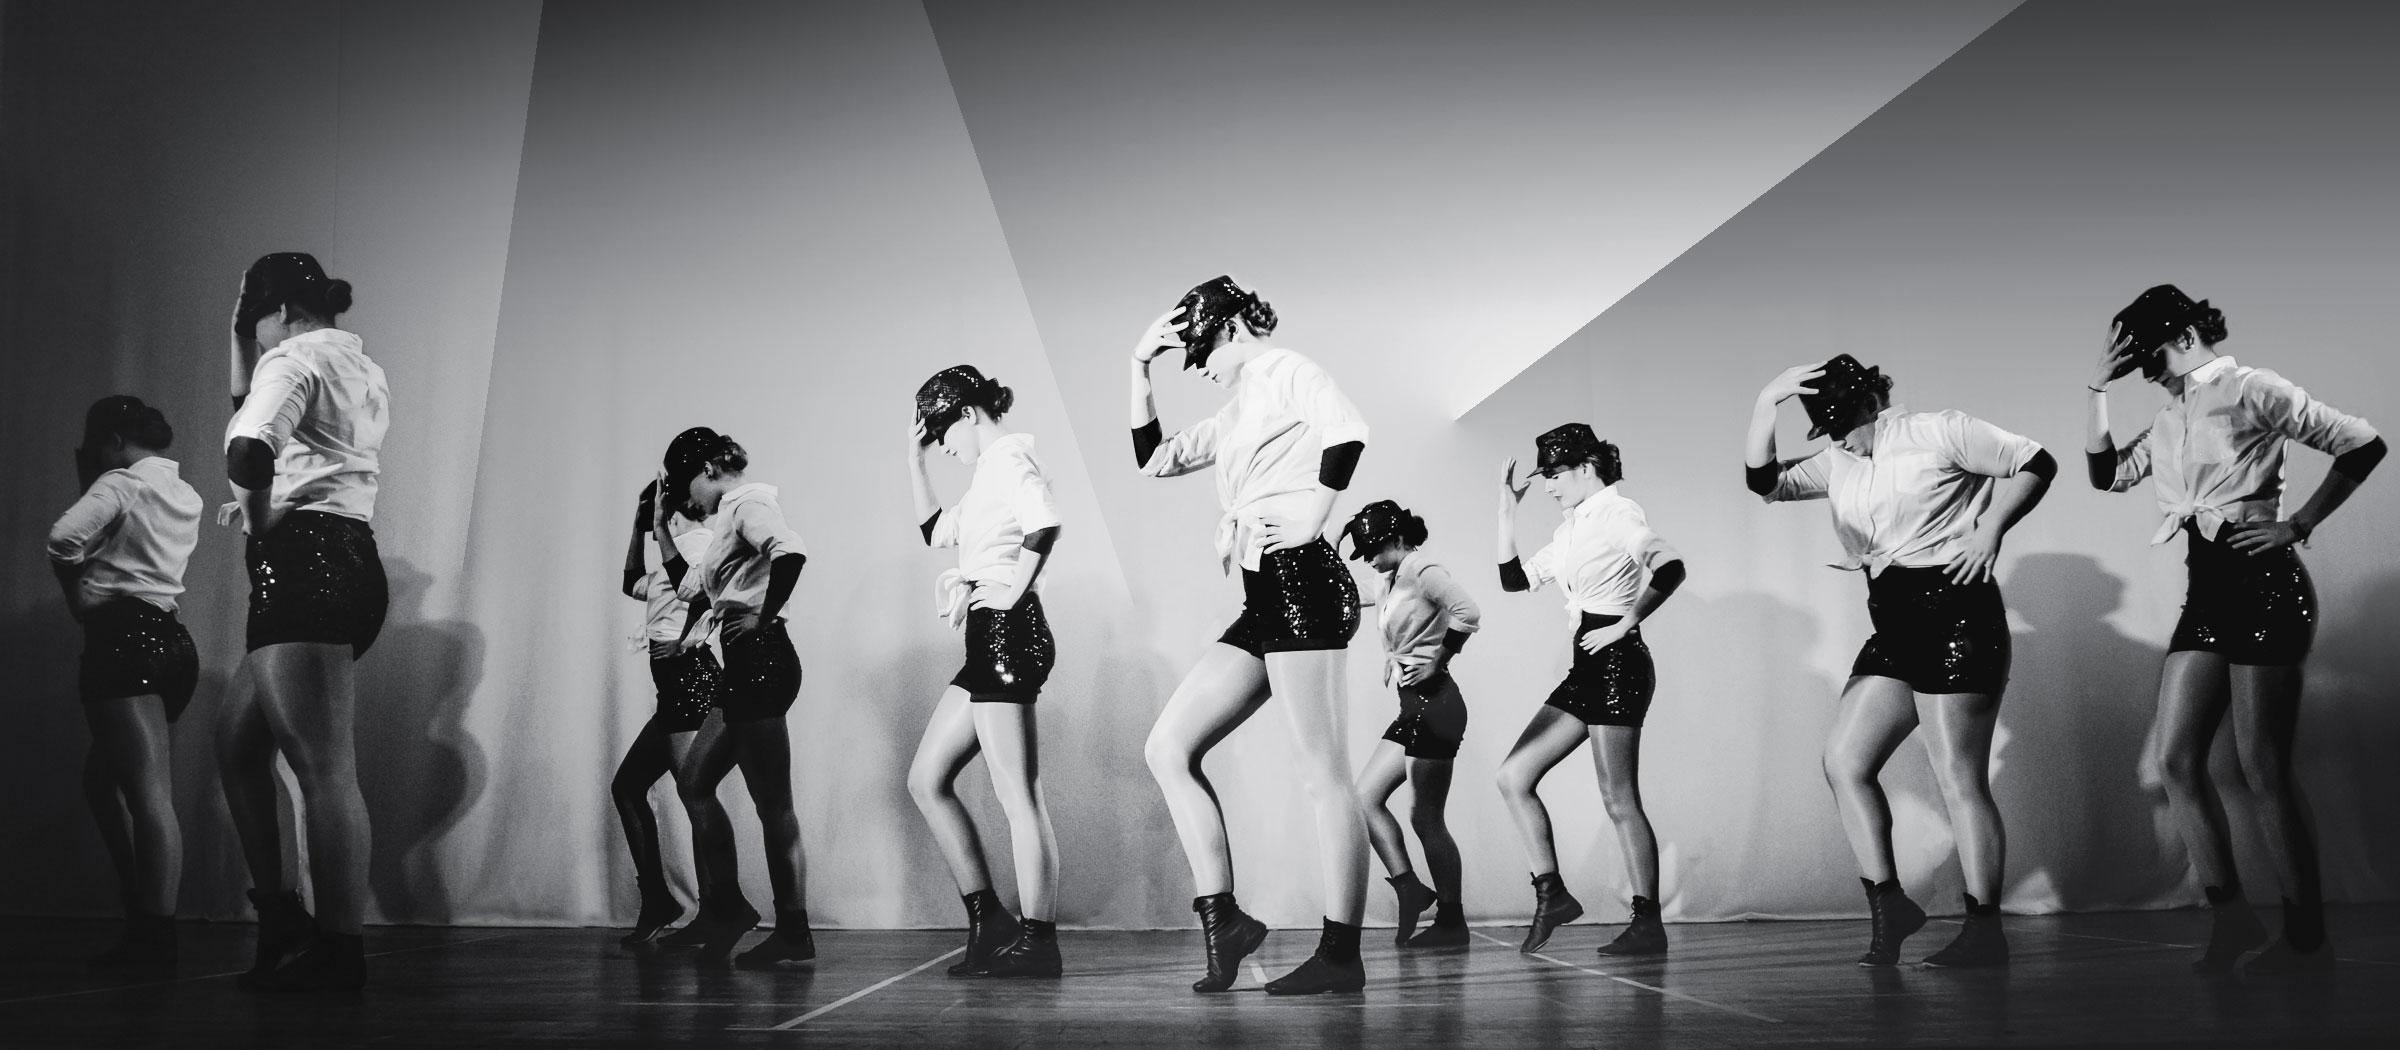 DANCE-4-FUN_SLIDER-01_AGENTS